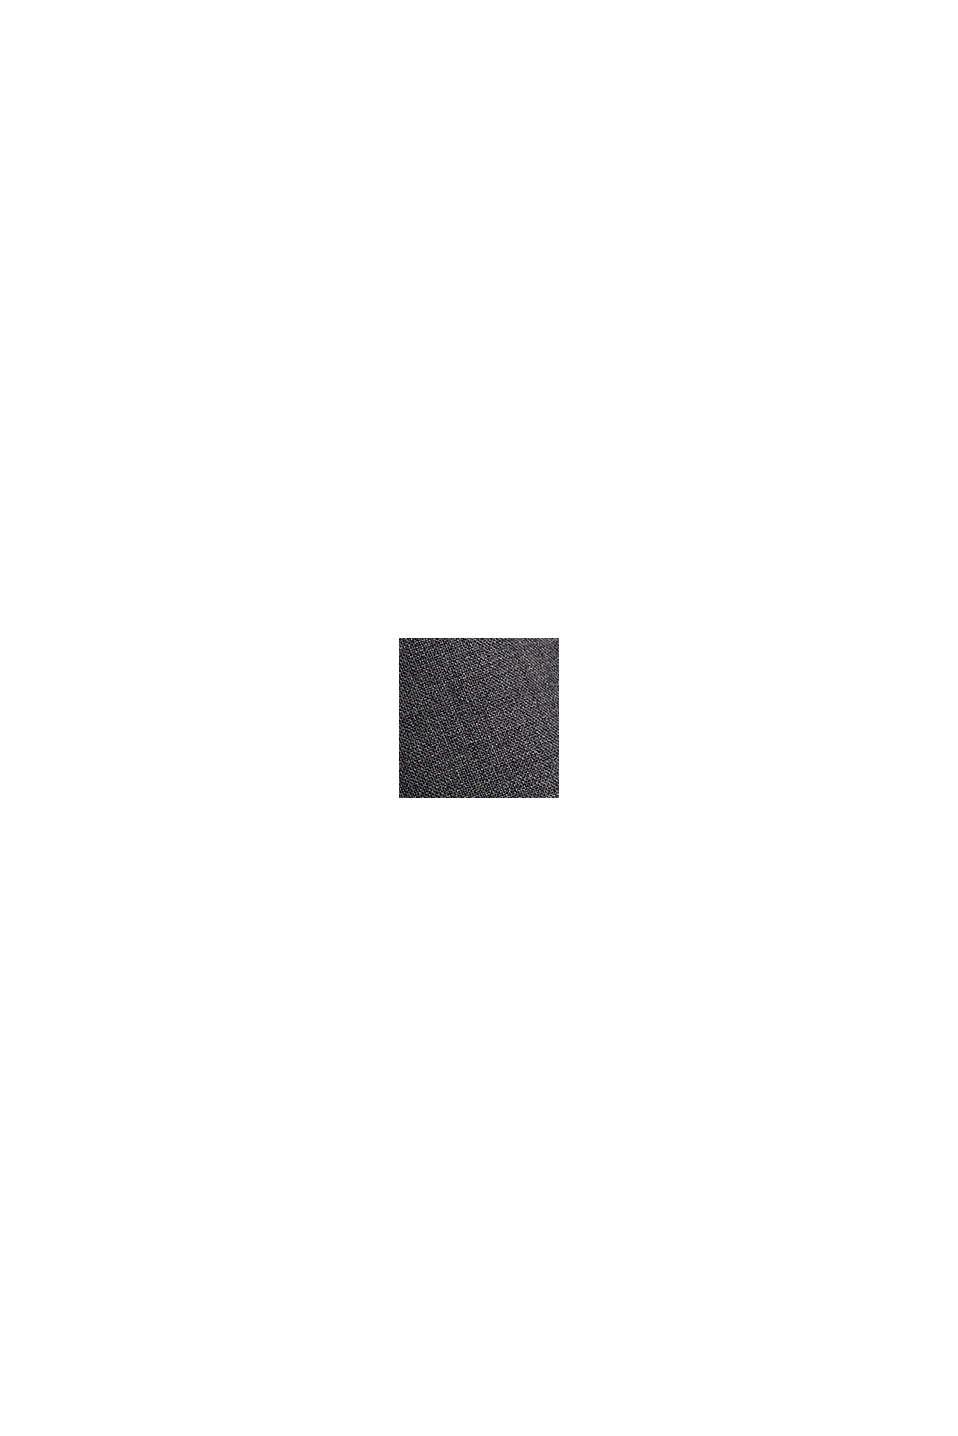 Giacca da completo in misto lana ACTIVE SUIT, DARK GREY, swatch